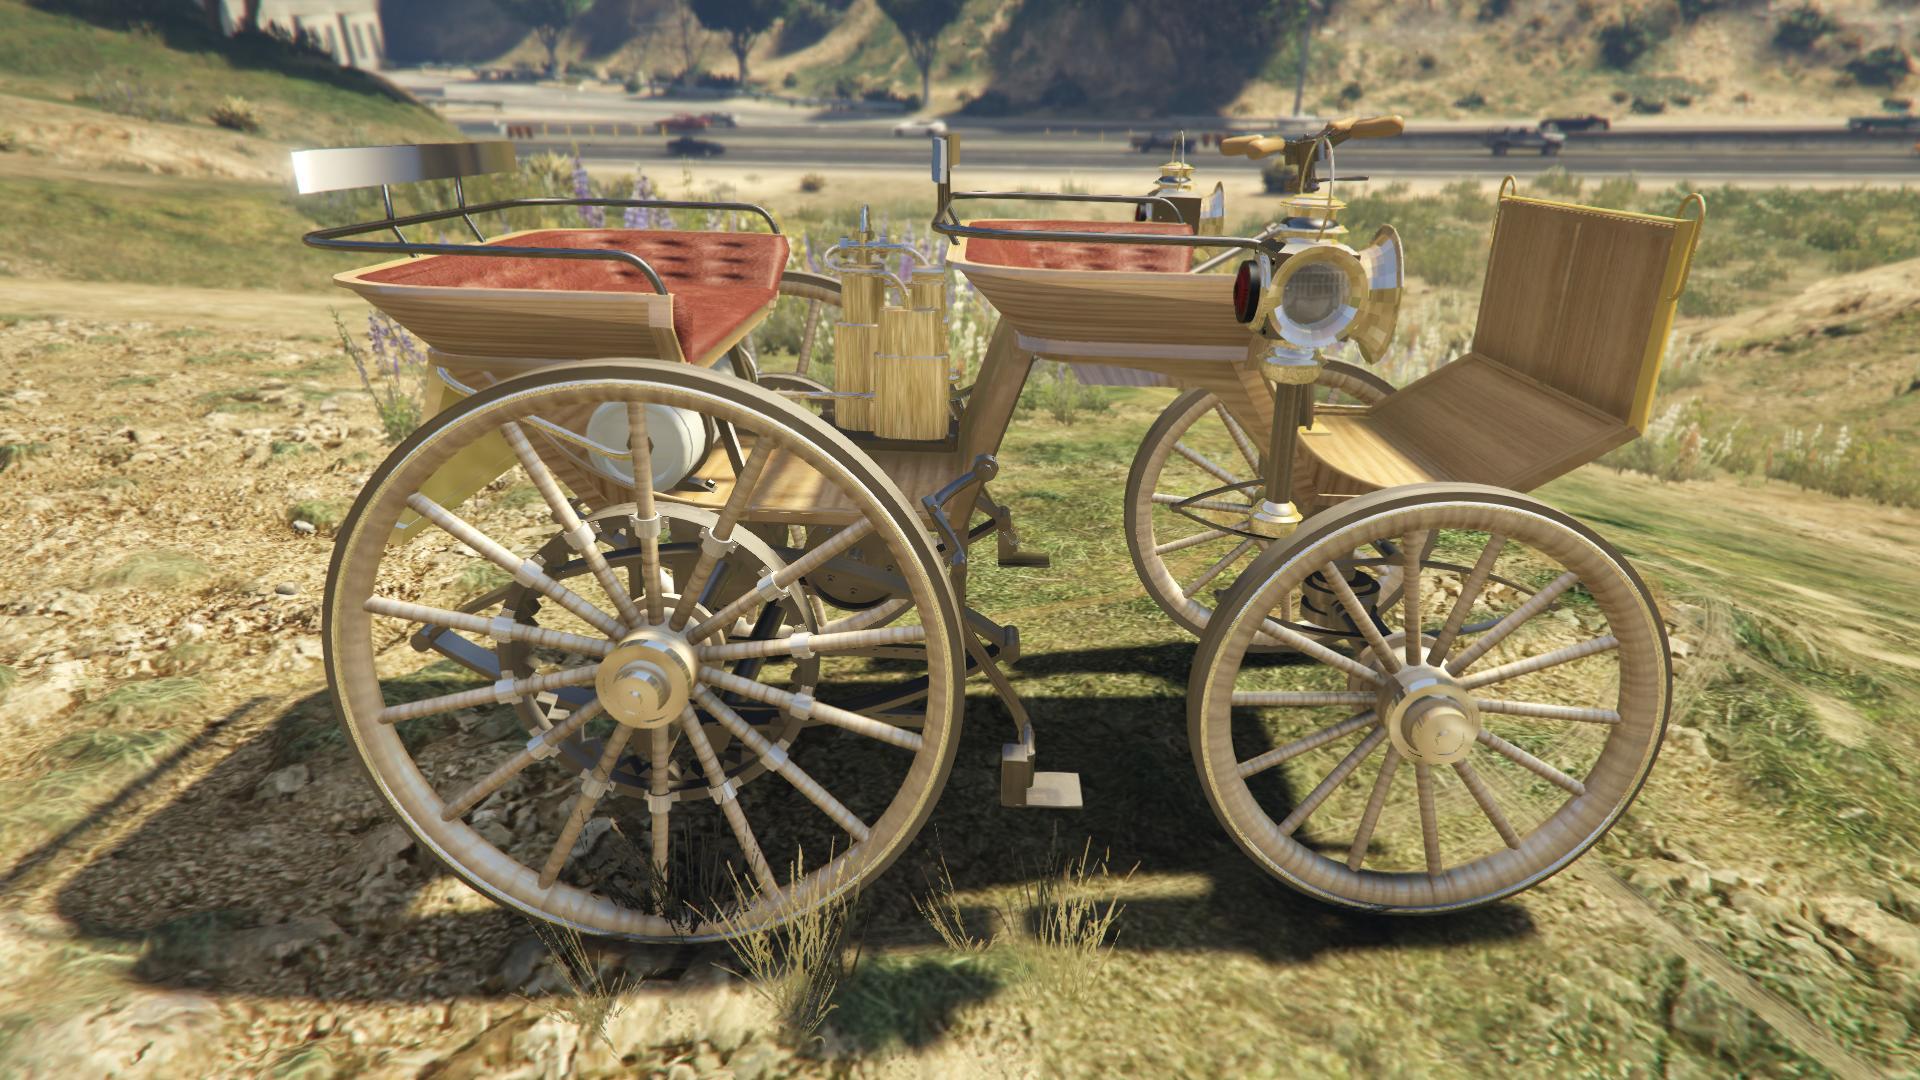 Daimler 1886 для GTA V - Скриншот 3